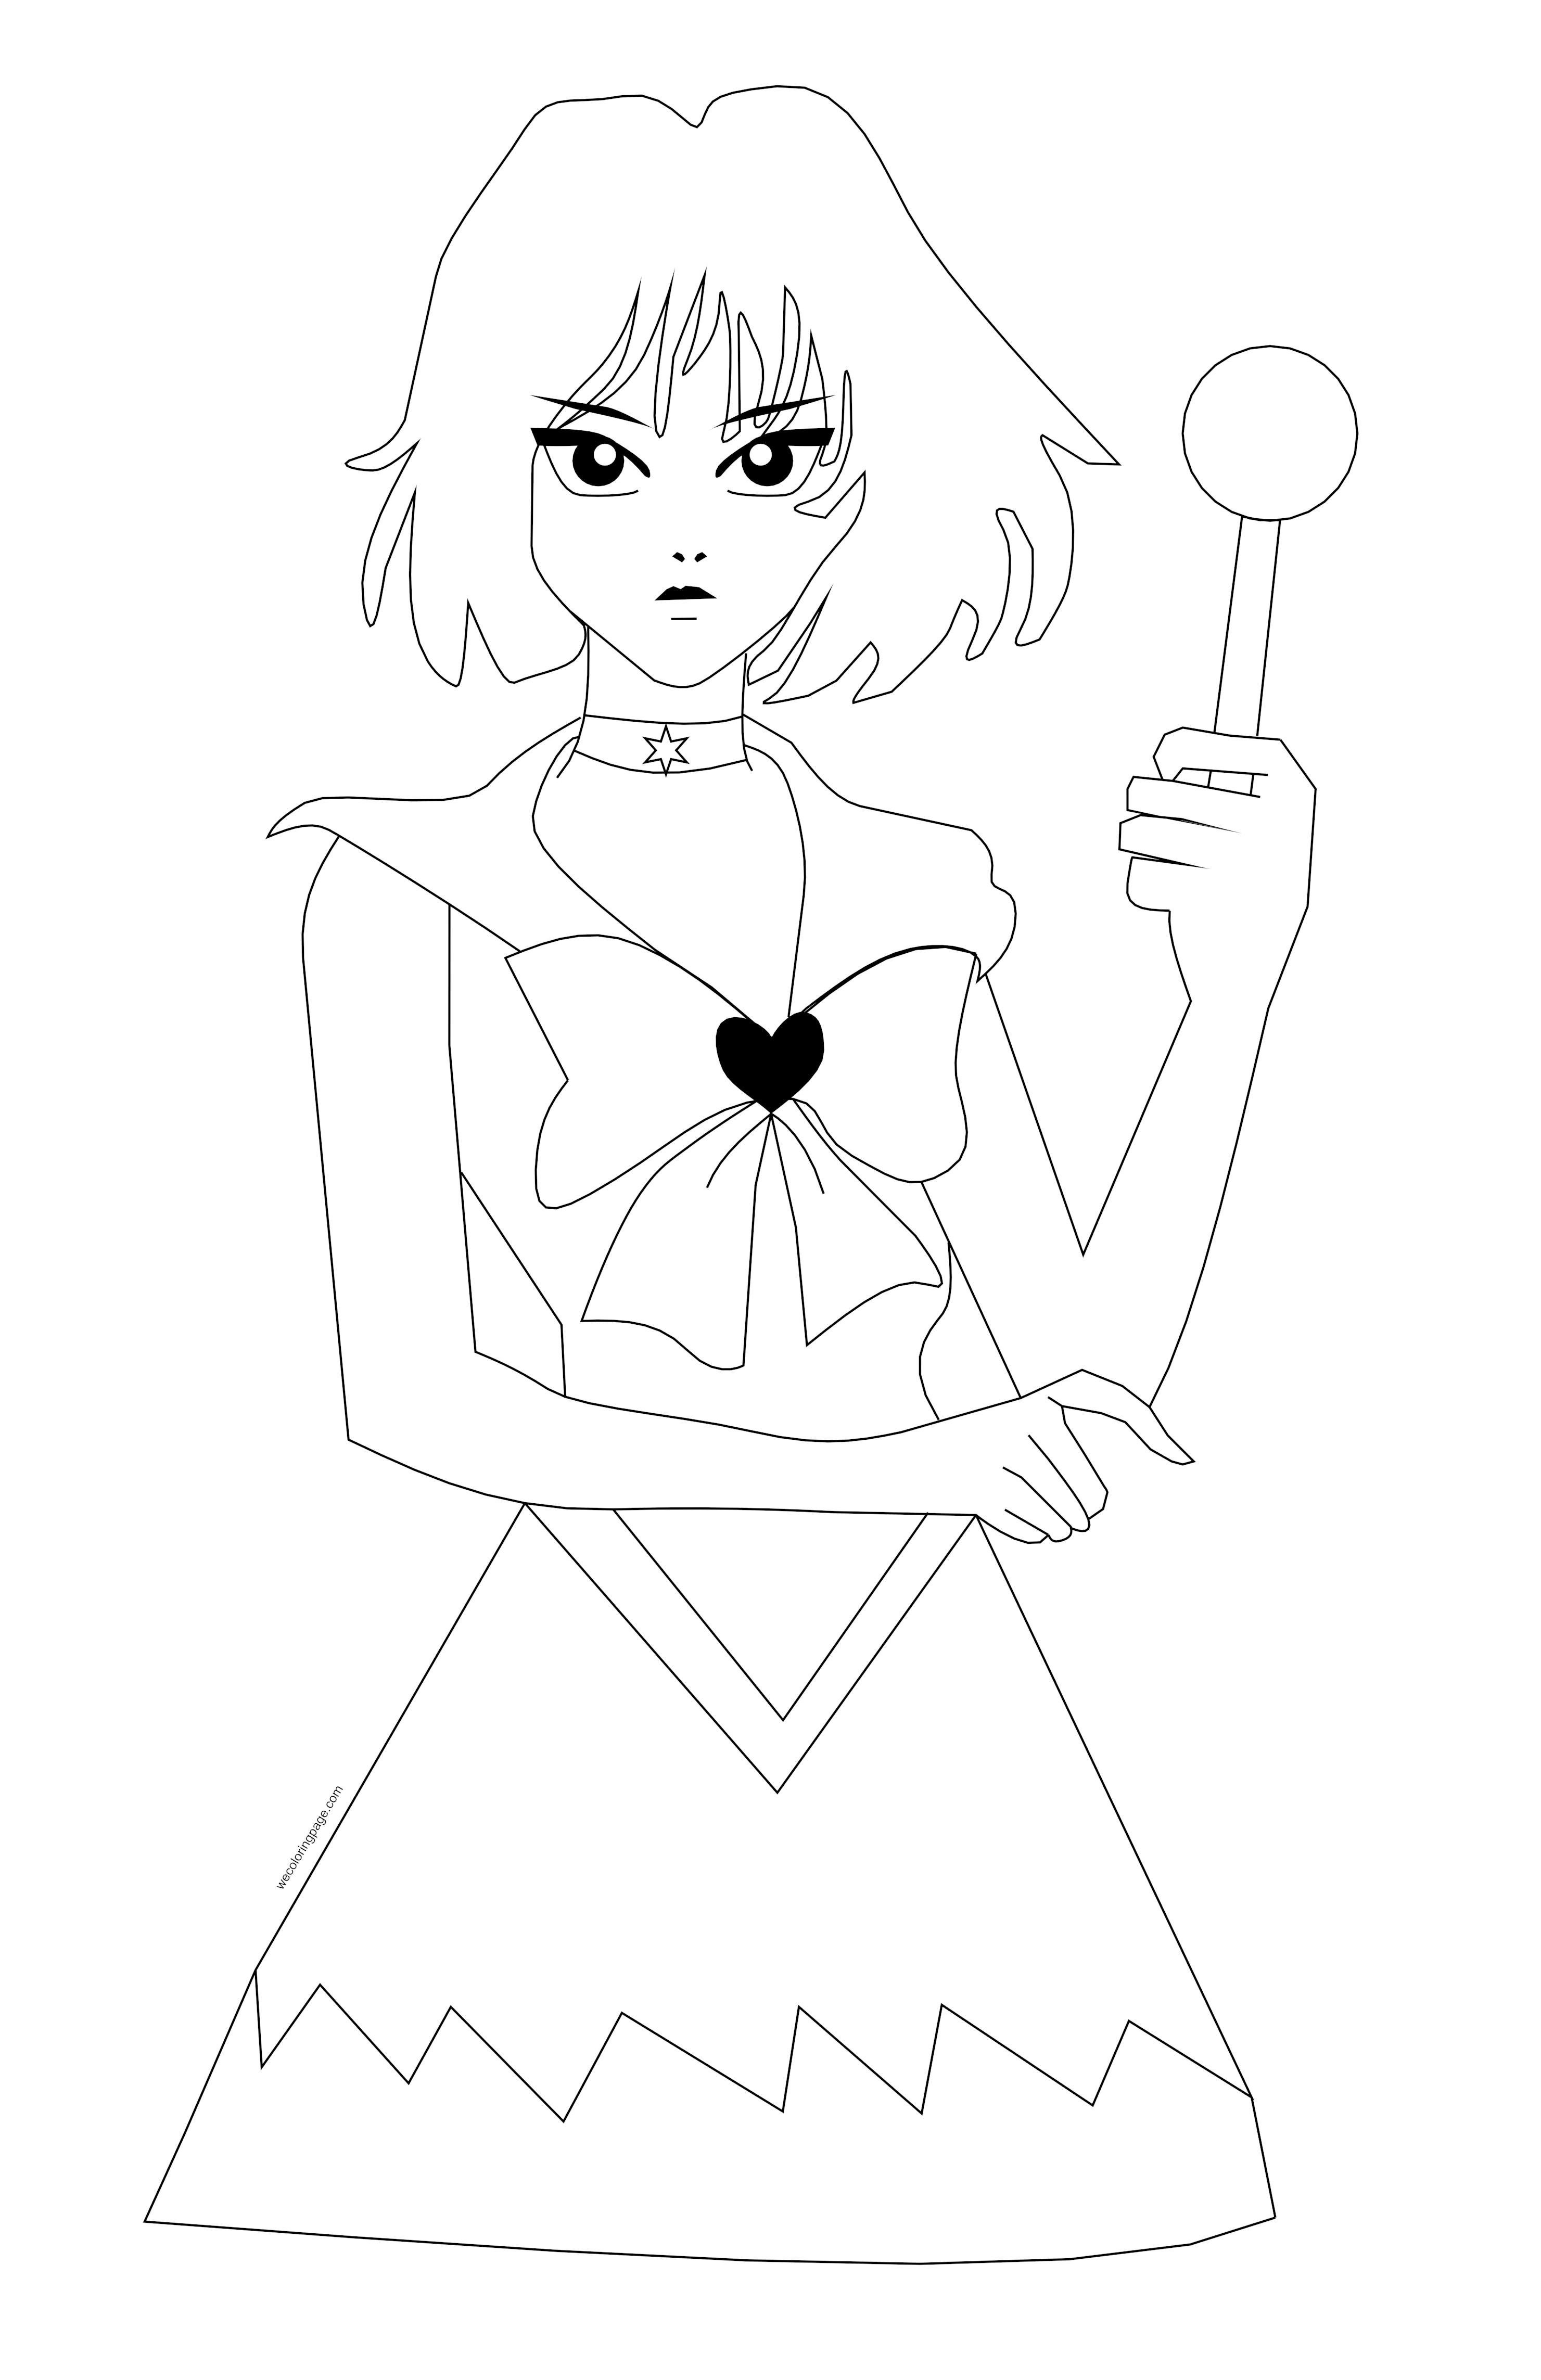 Princess Manga Girl Magic Stick Coloring Page